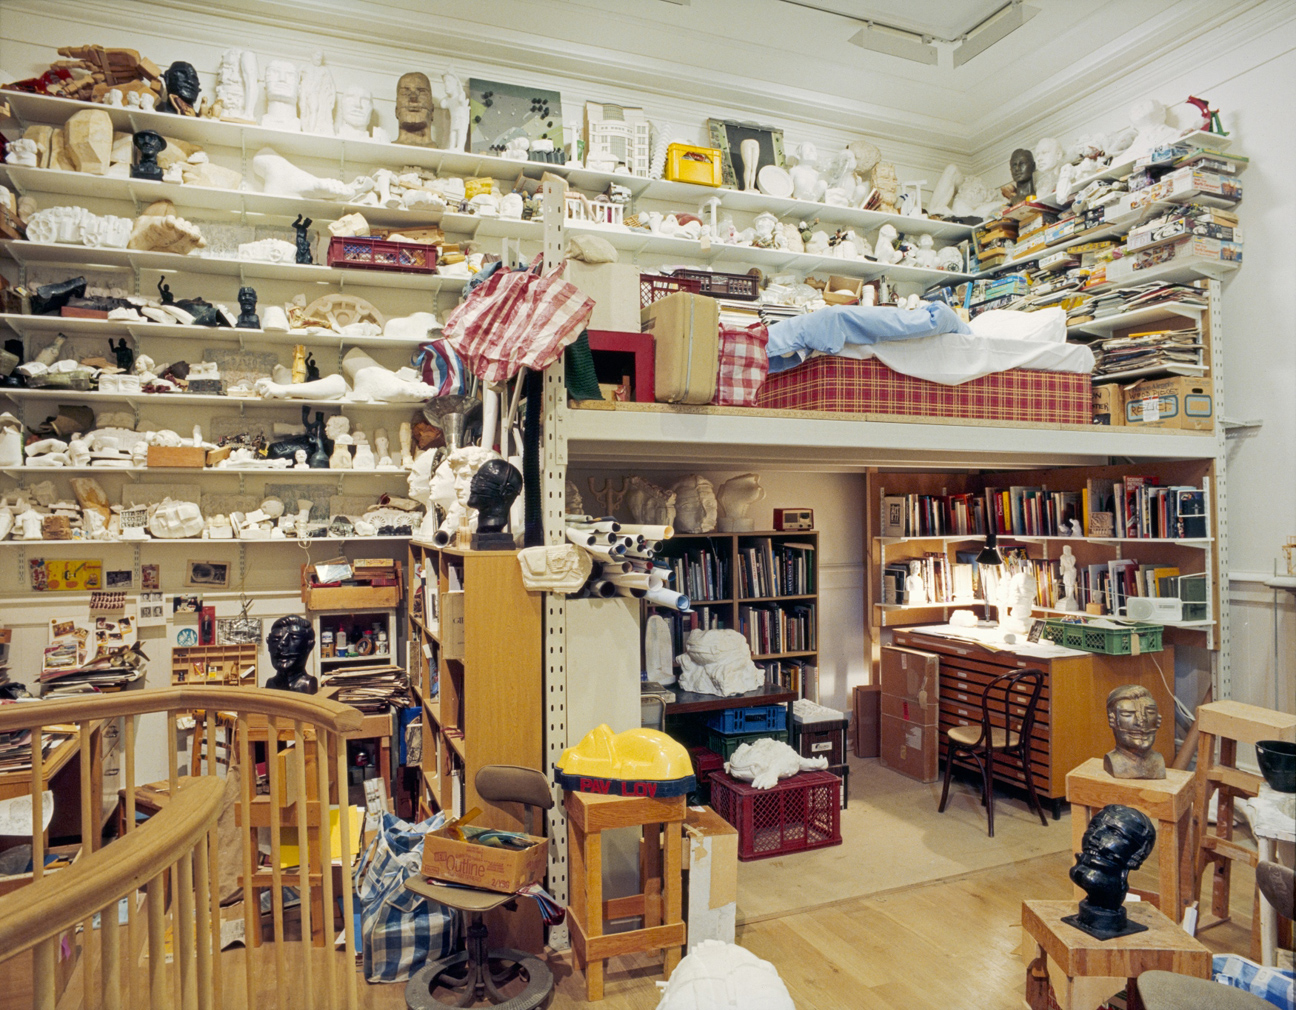 Paolozzi's studio at Scottish National Gallery of Modern Art